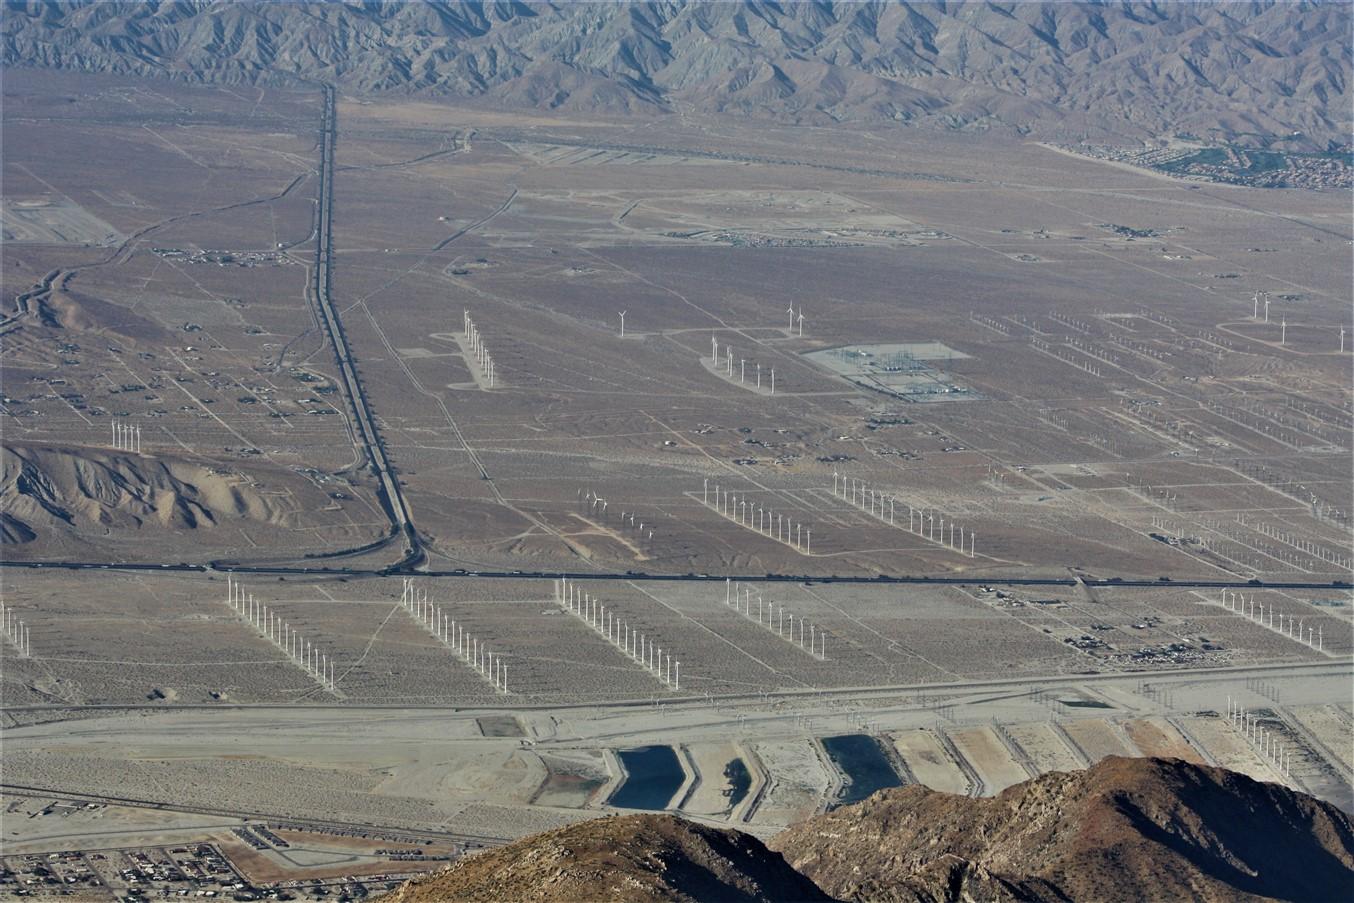 2009 08 24 107 Mt San Jacinto and Palm Springs Tram.jpg